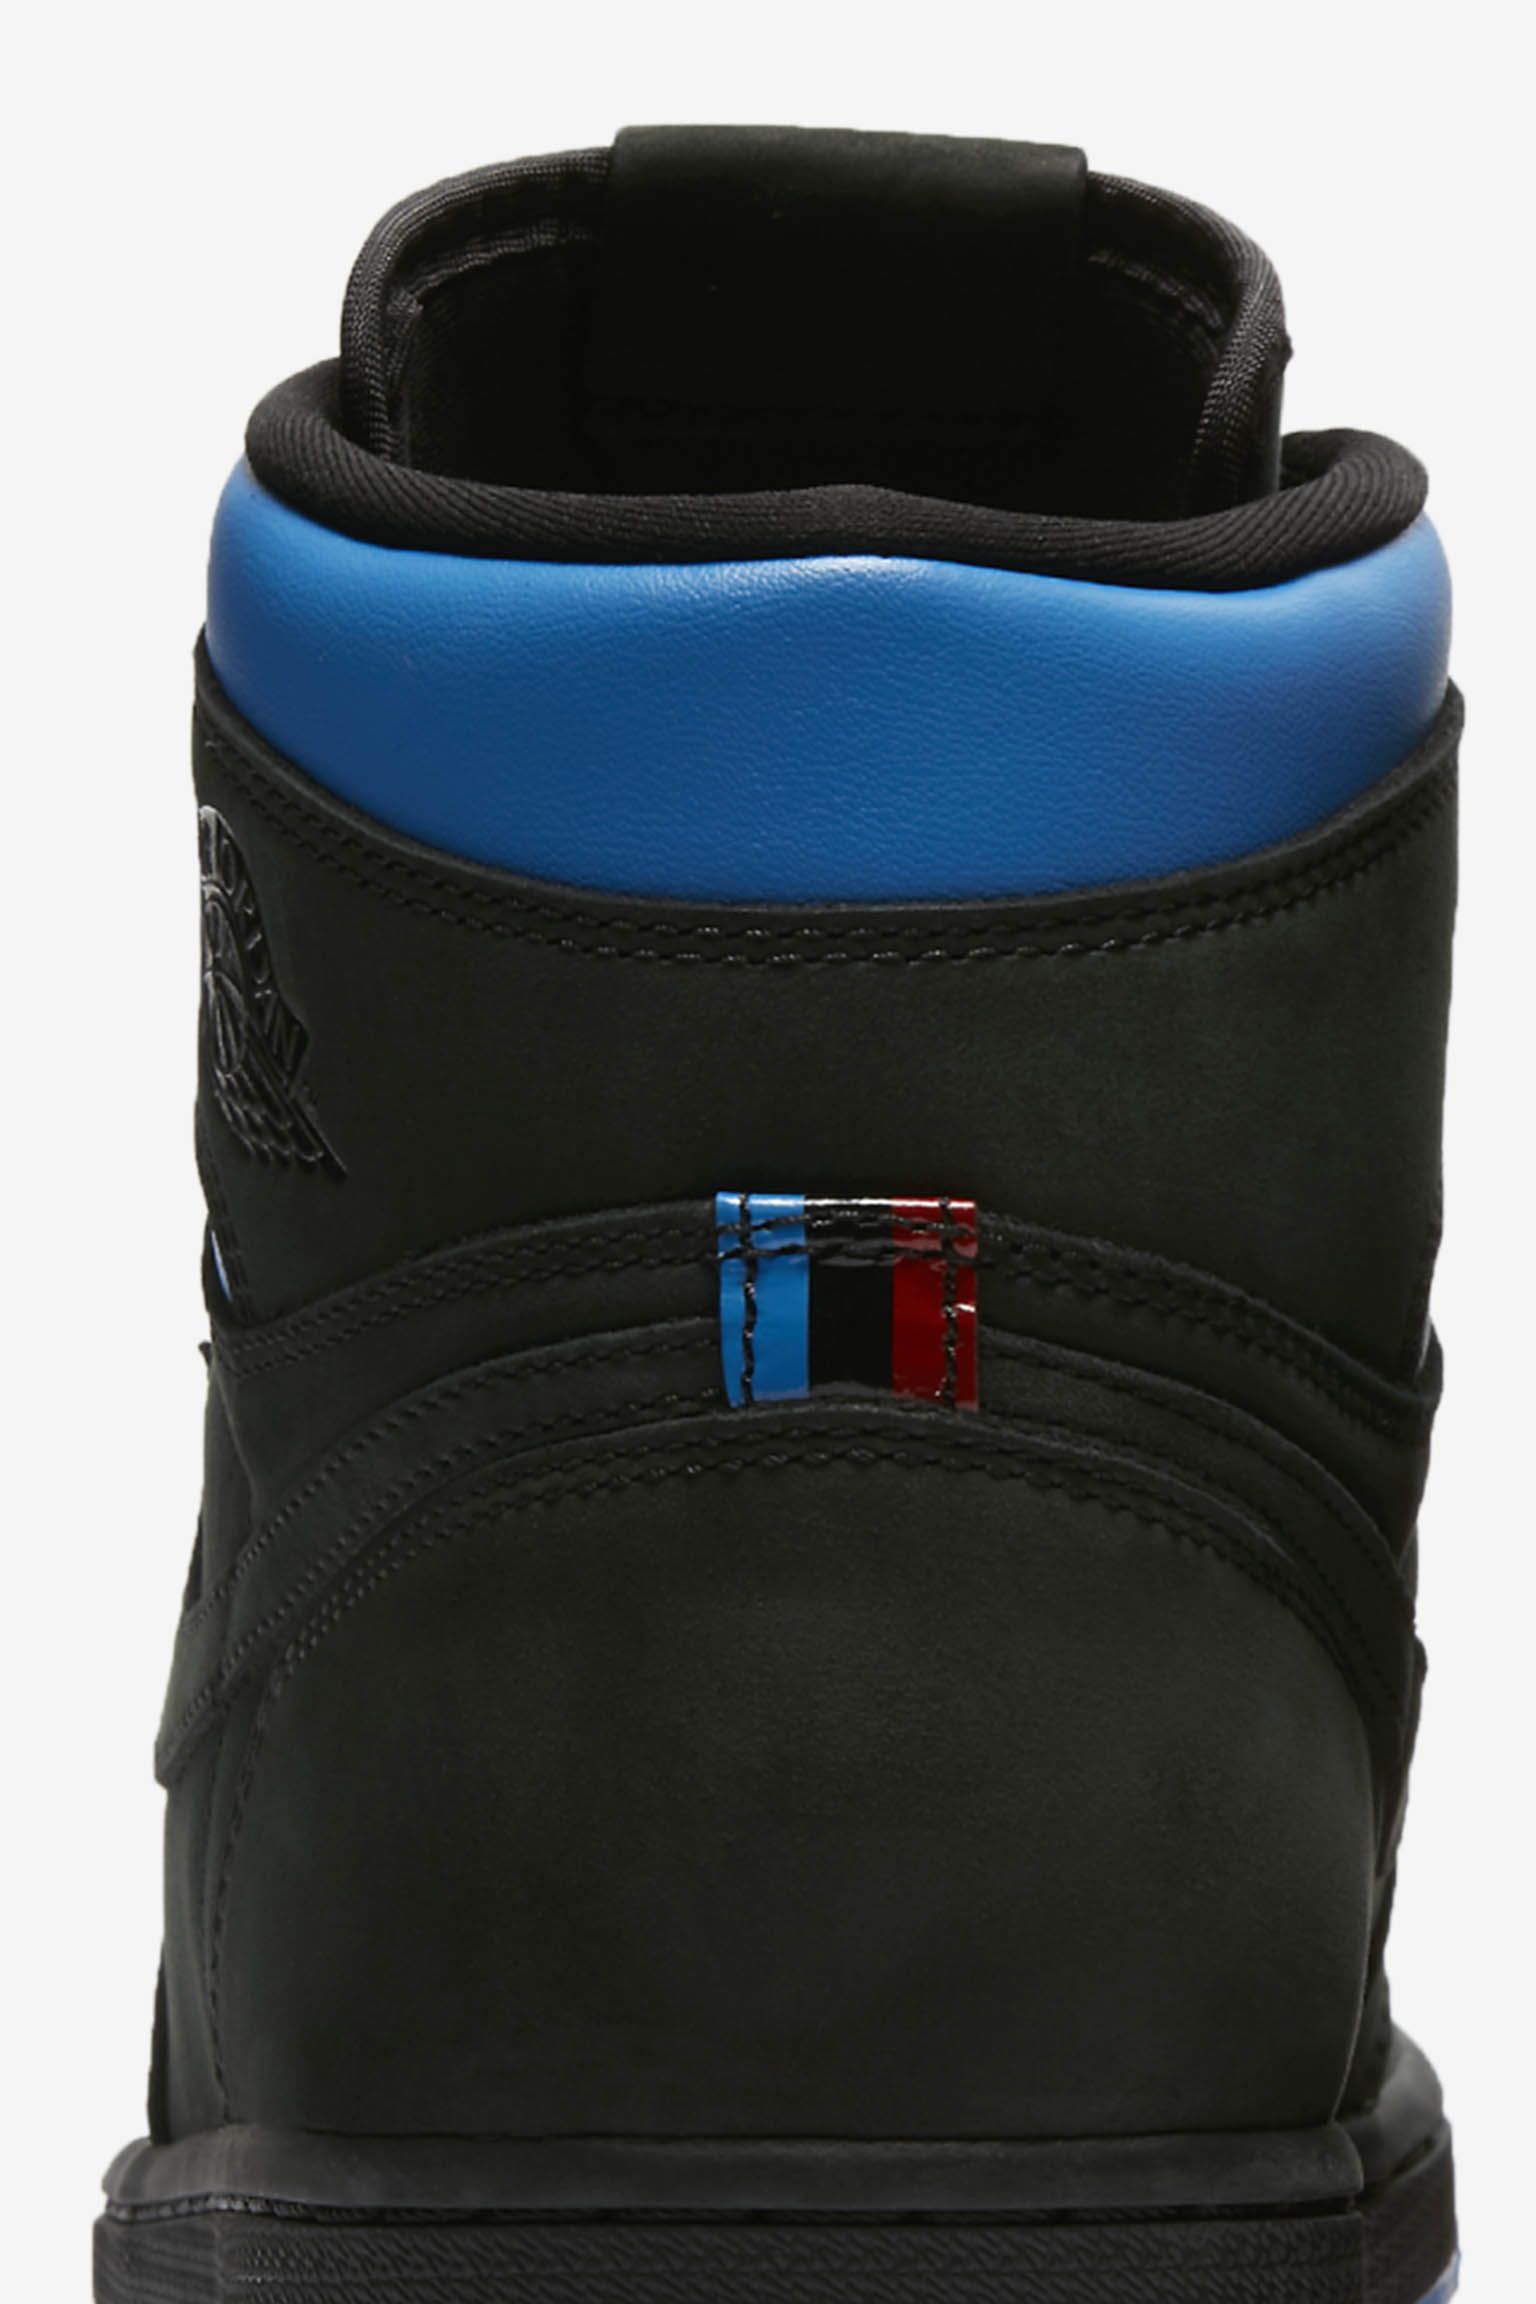 super popular 3b6ff 2d9cc ... new style air jordan 1 retro hi og q54 black university red italy blue  220e4 3e1d6